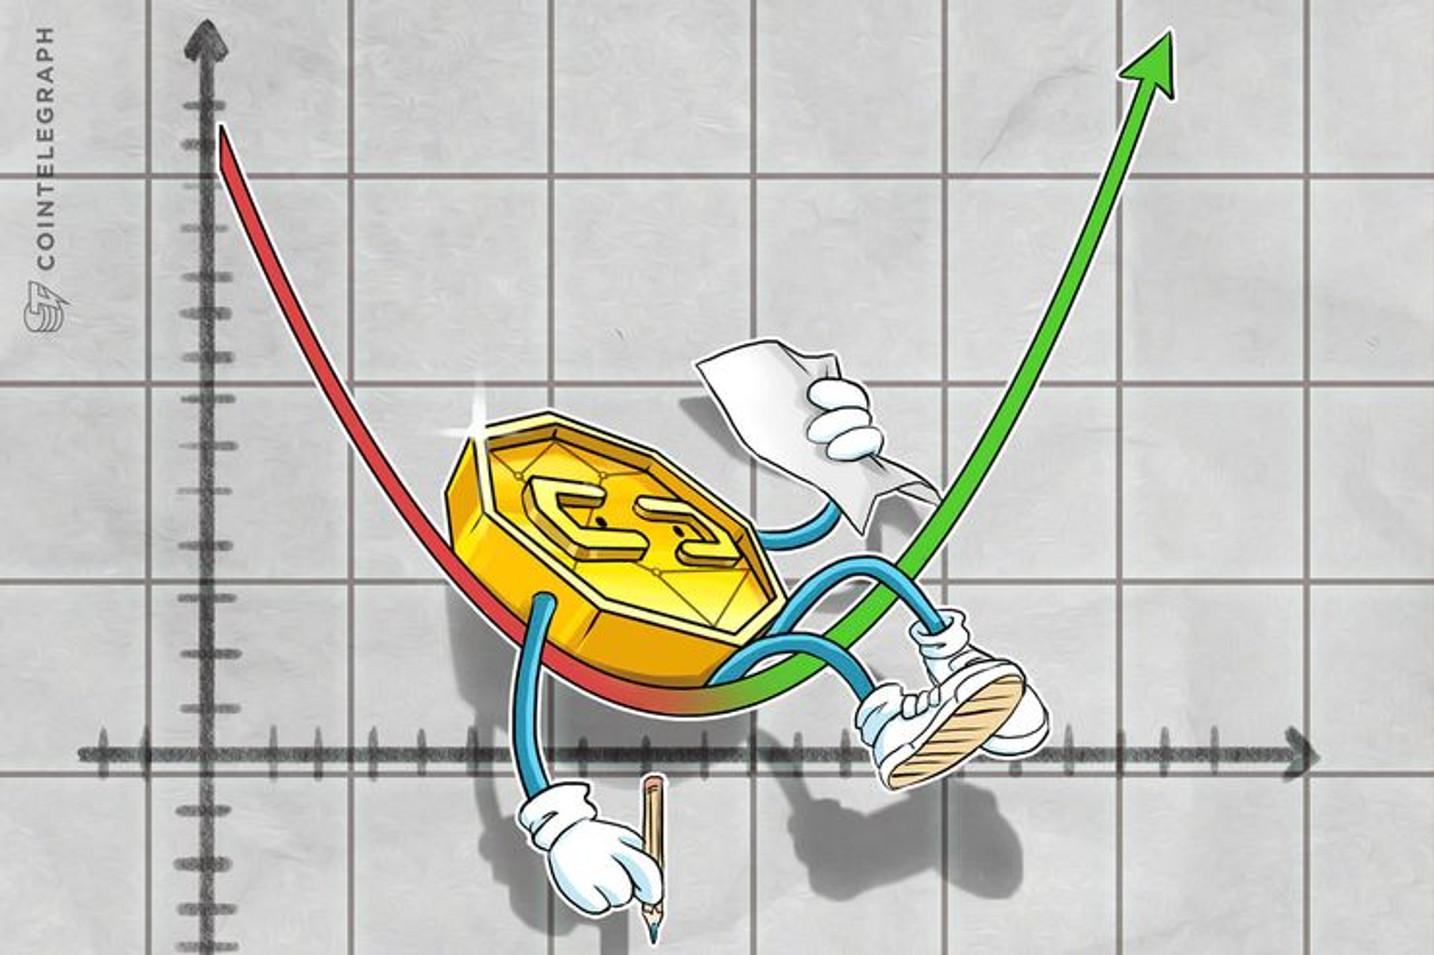 Contrariando previsões, Bitcoin rompe sequência de baixa valoriza 8% e volta a negociar acima de US$ 10 mil